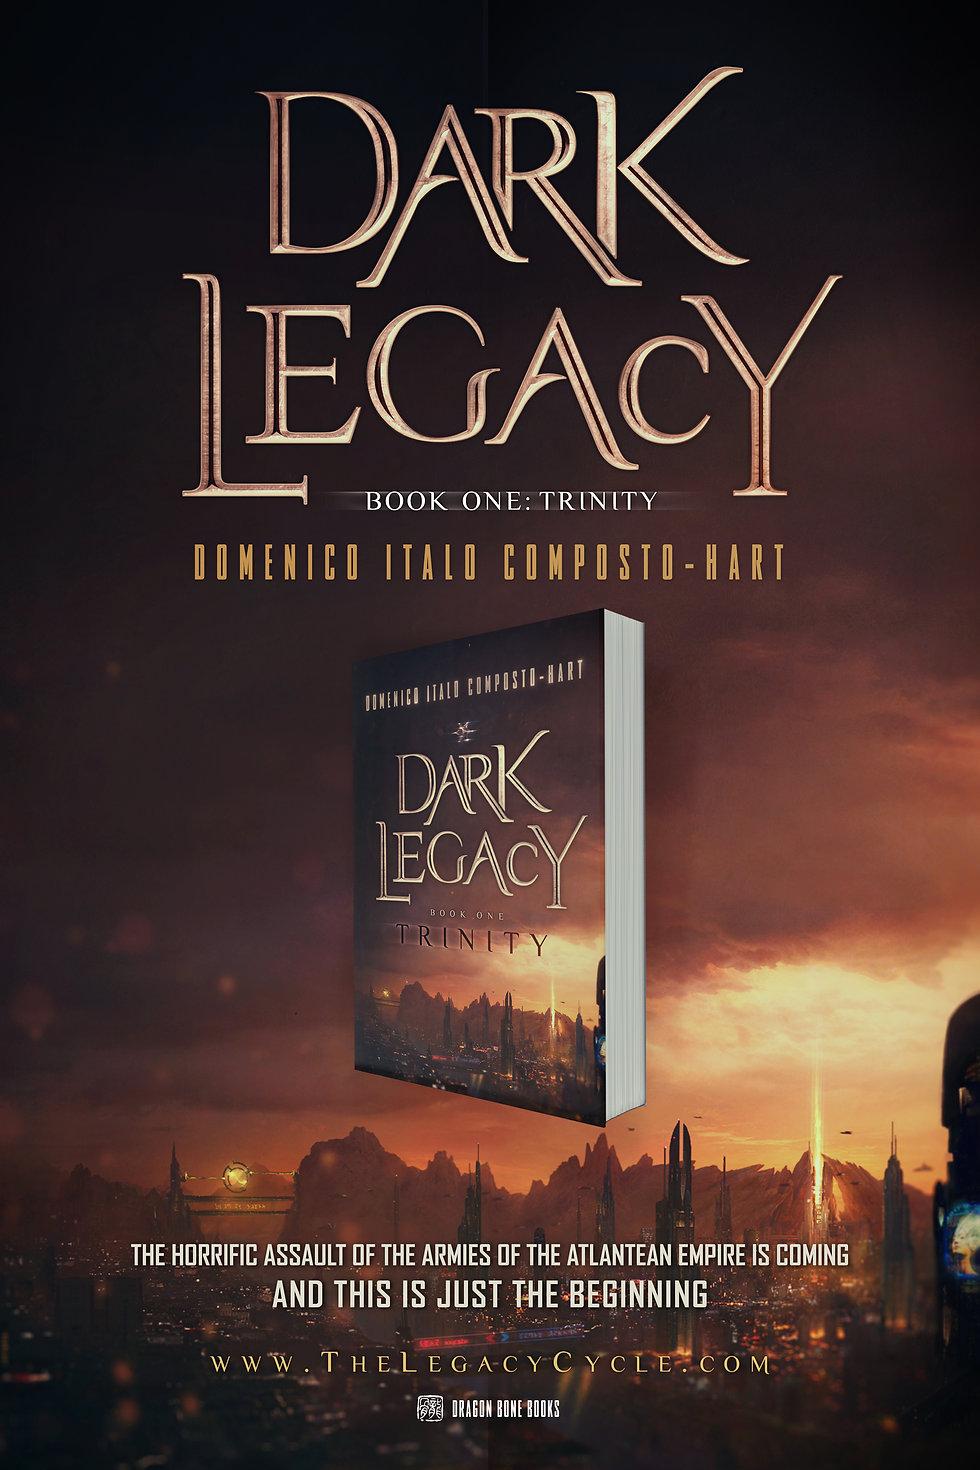 Dark Legacy Poster.jpg